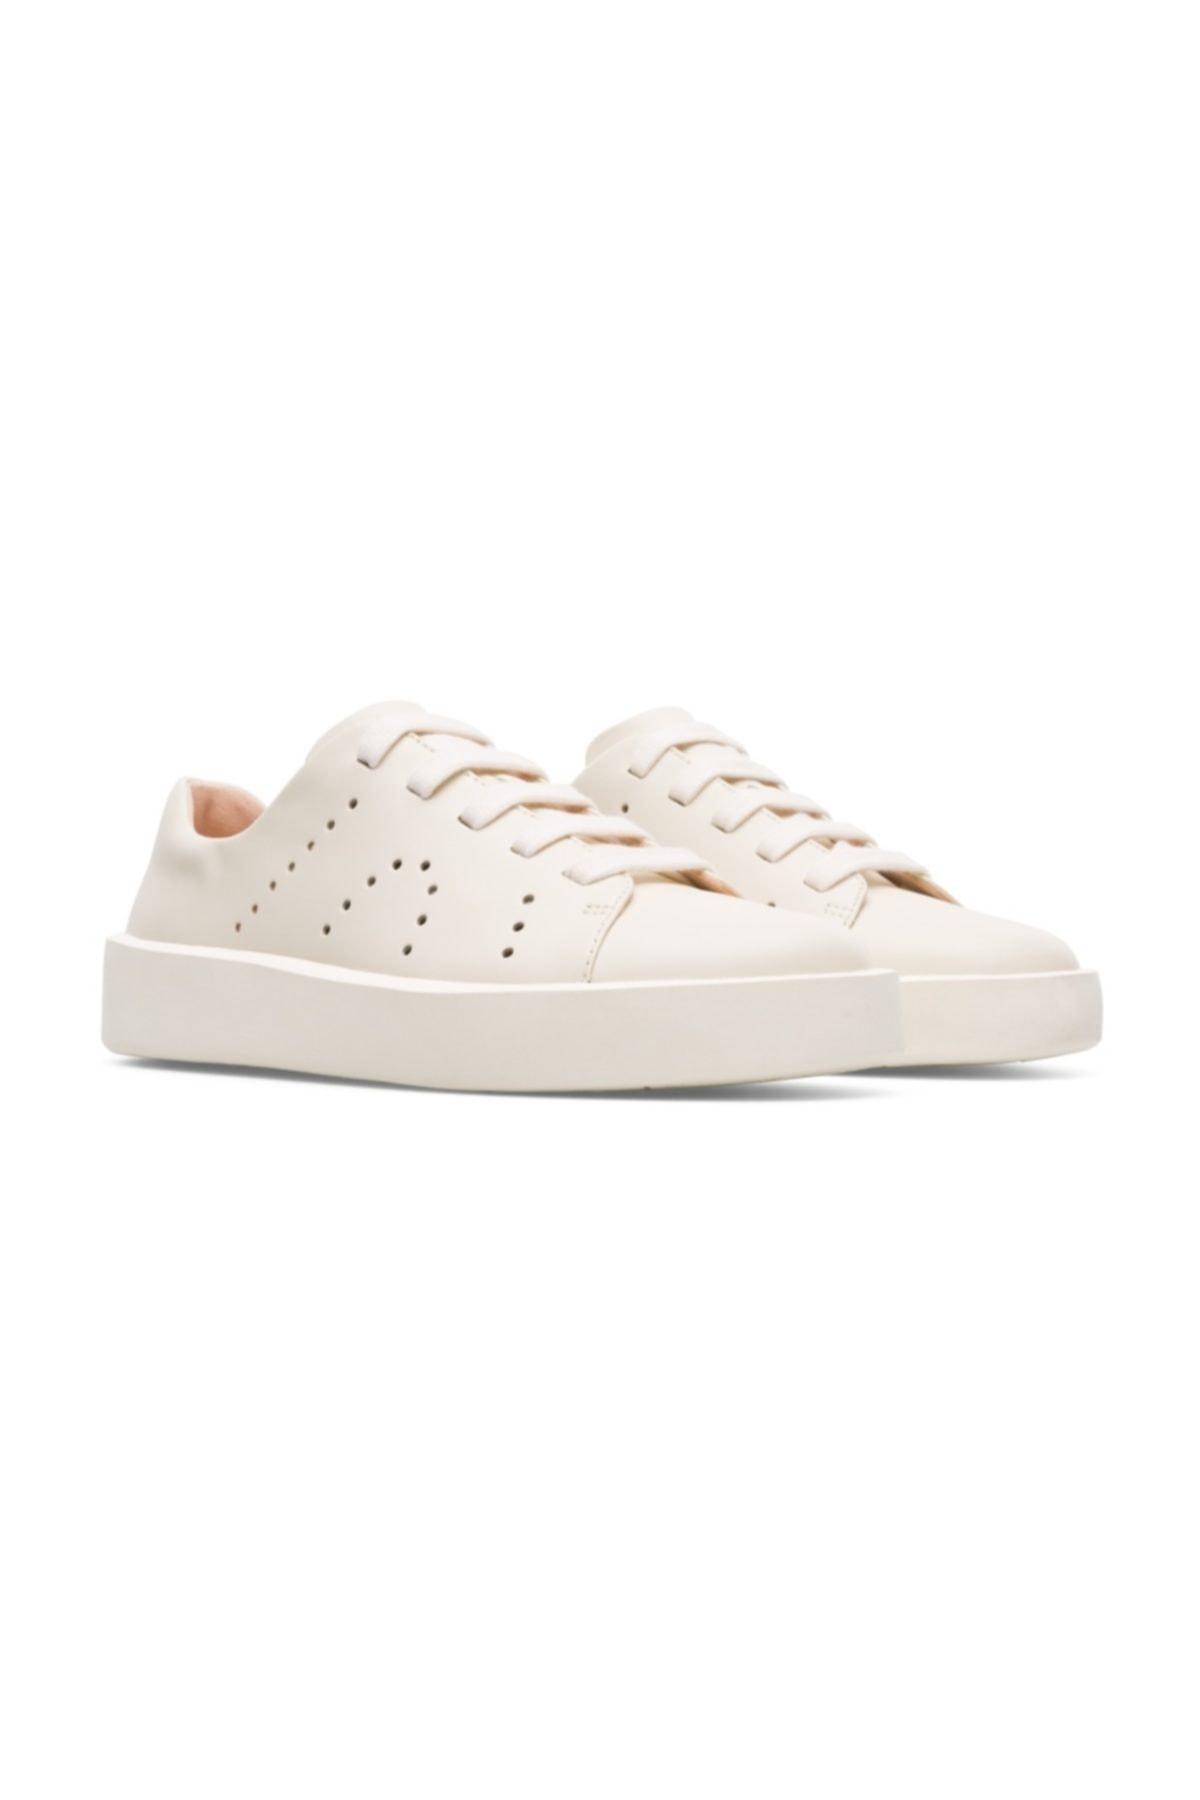 CAMPER Kadın Courb Sneaker K200828-022 2